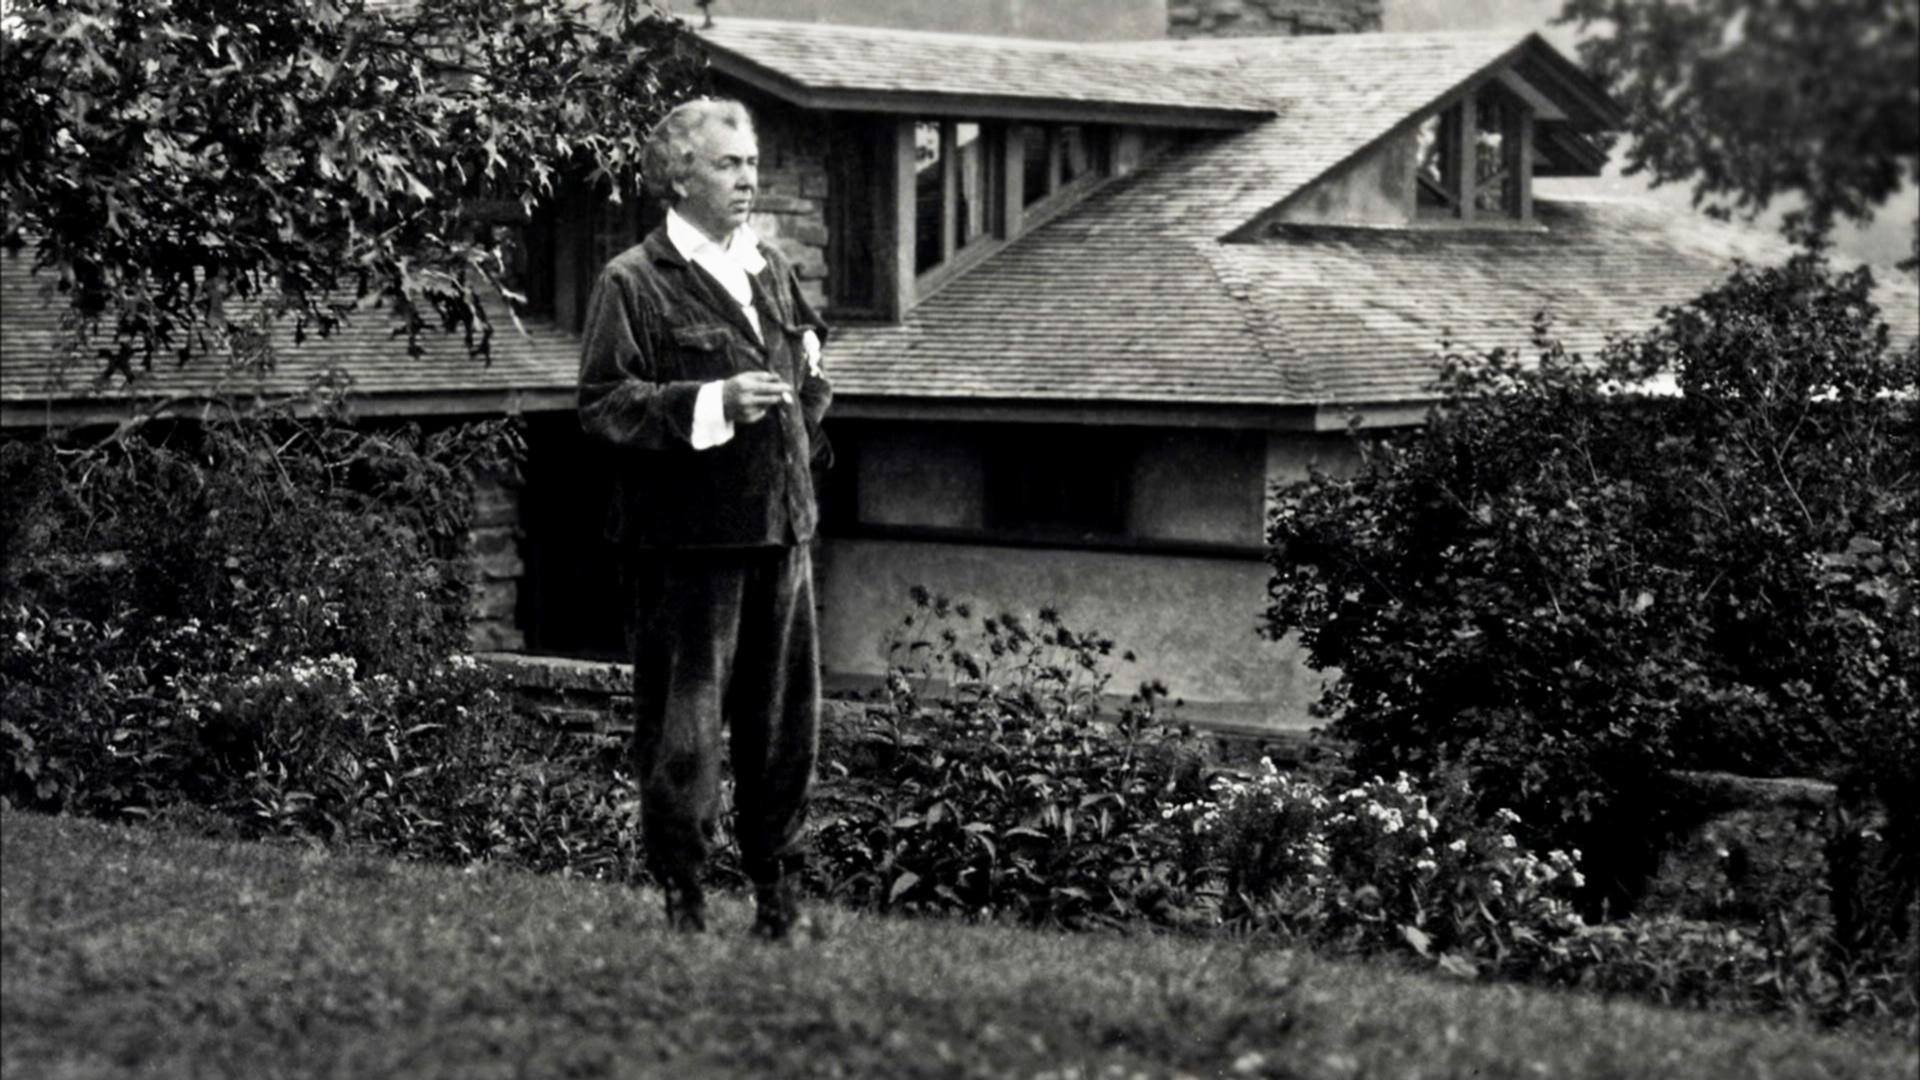 Frank Lloyd Wright's Buffalo